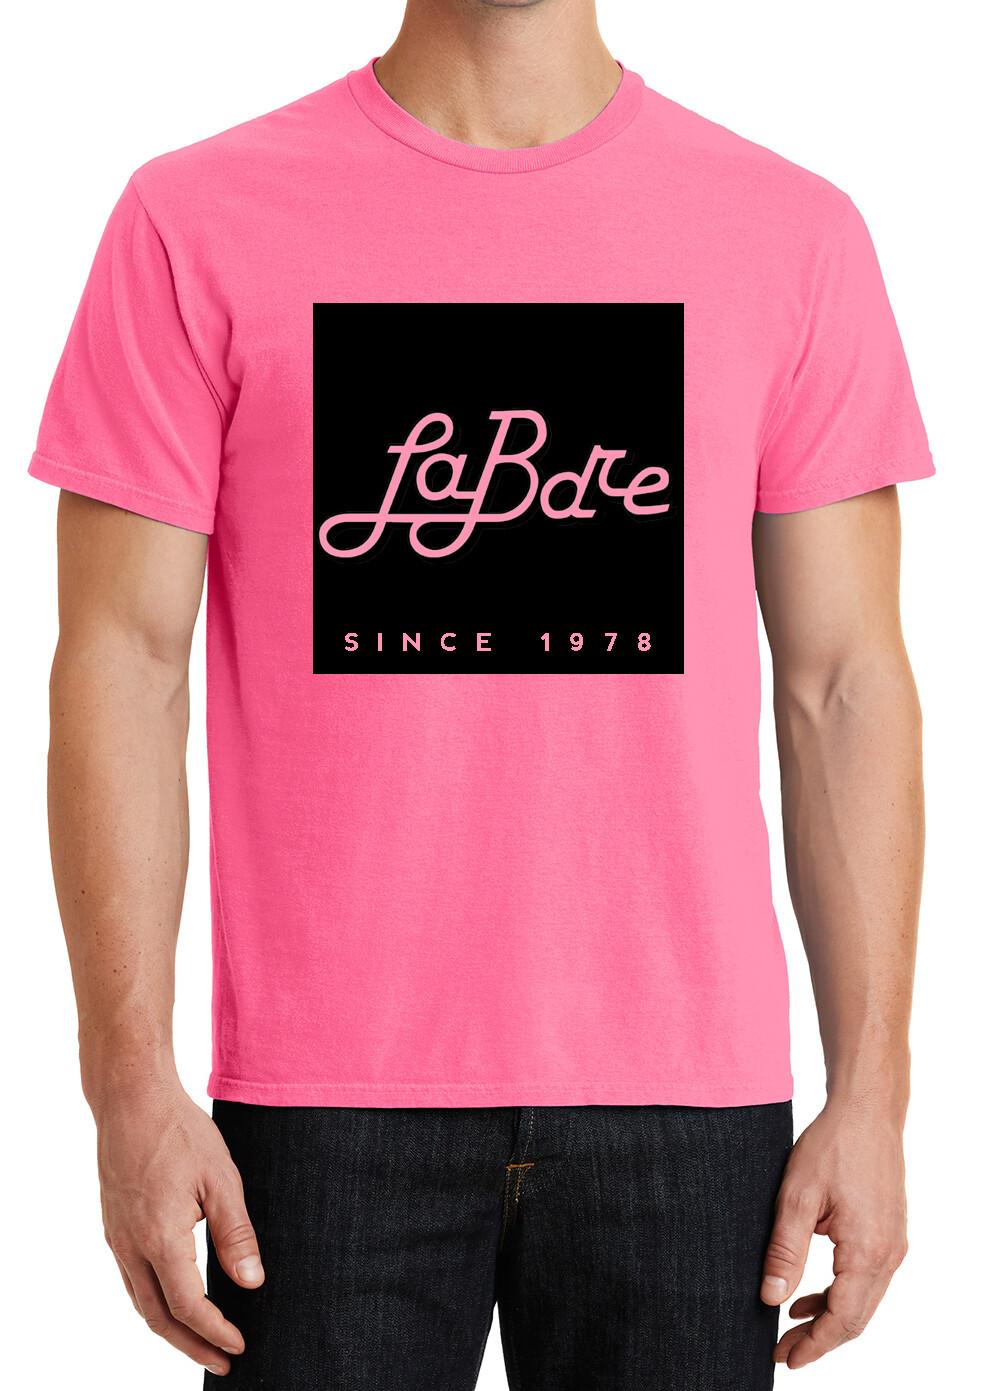 """Since 1978"" Shirt"